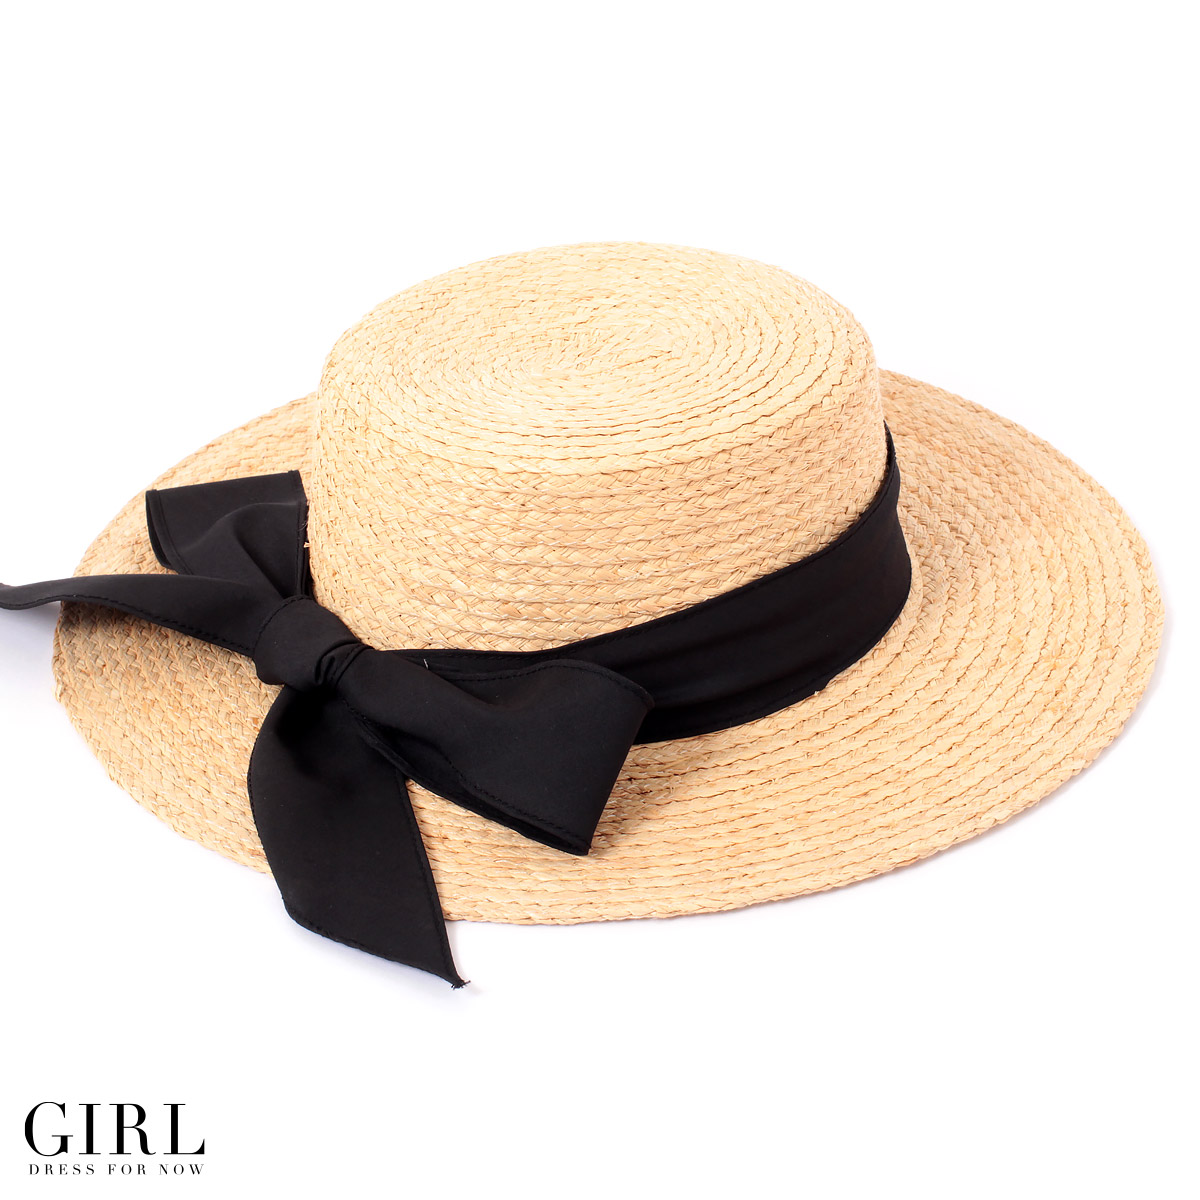 3ea4b6eaf Big hat straw hat kids UV cut straw hat unisex wide brim size outdoor gift  Hat UV protection spring summer fall/winter sun women's men's solid child.